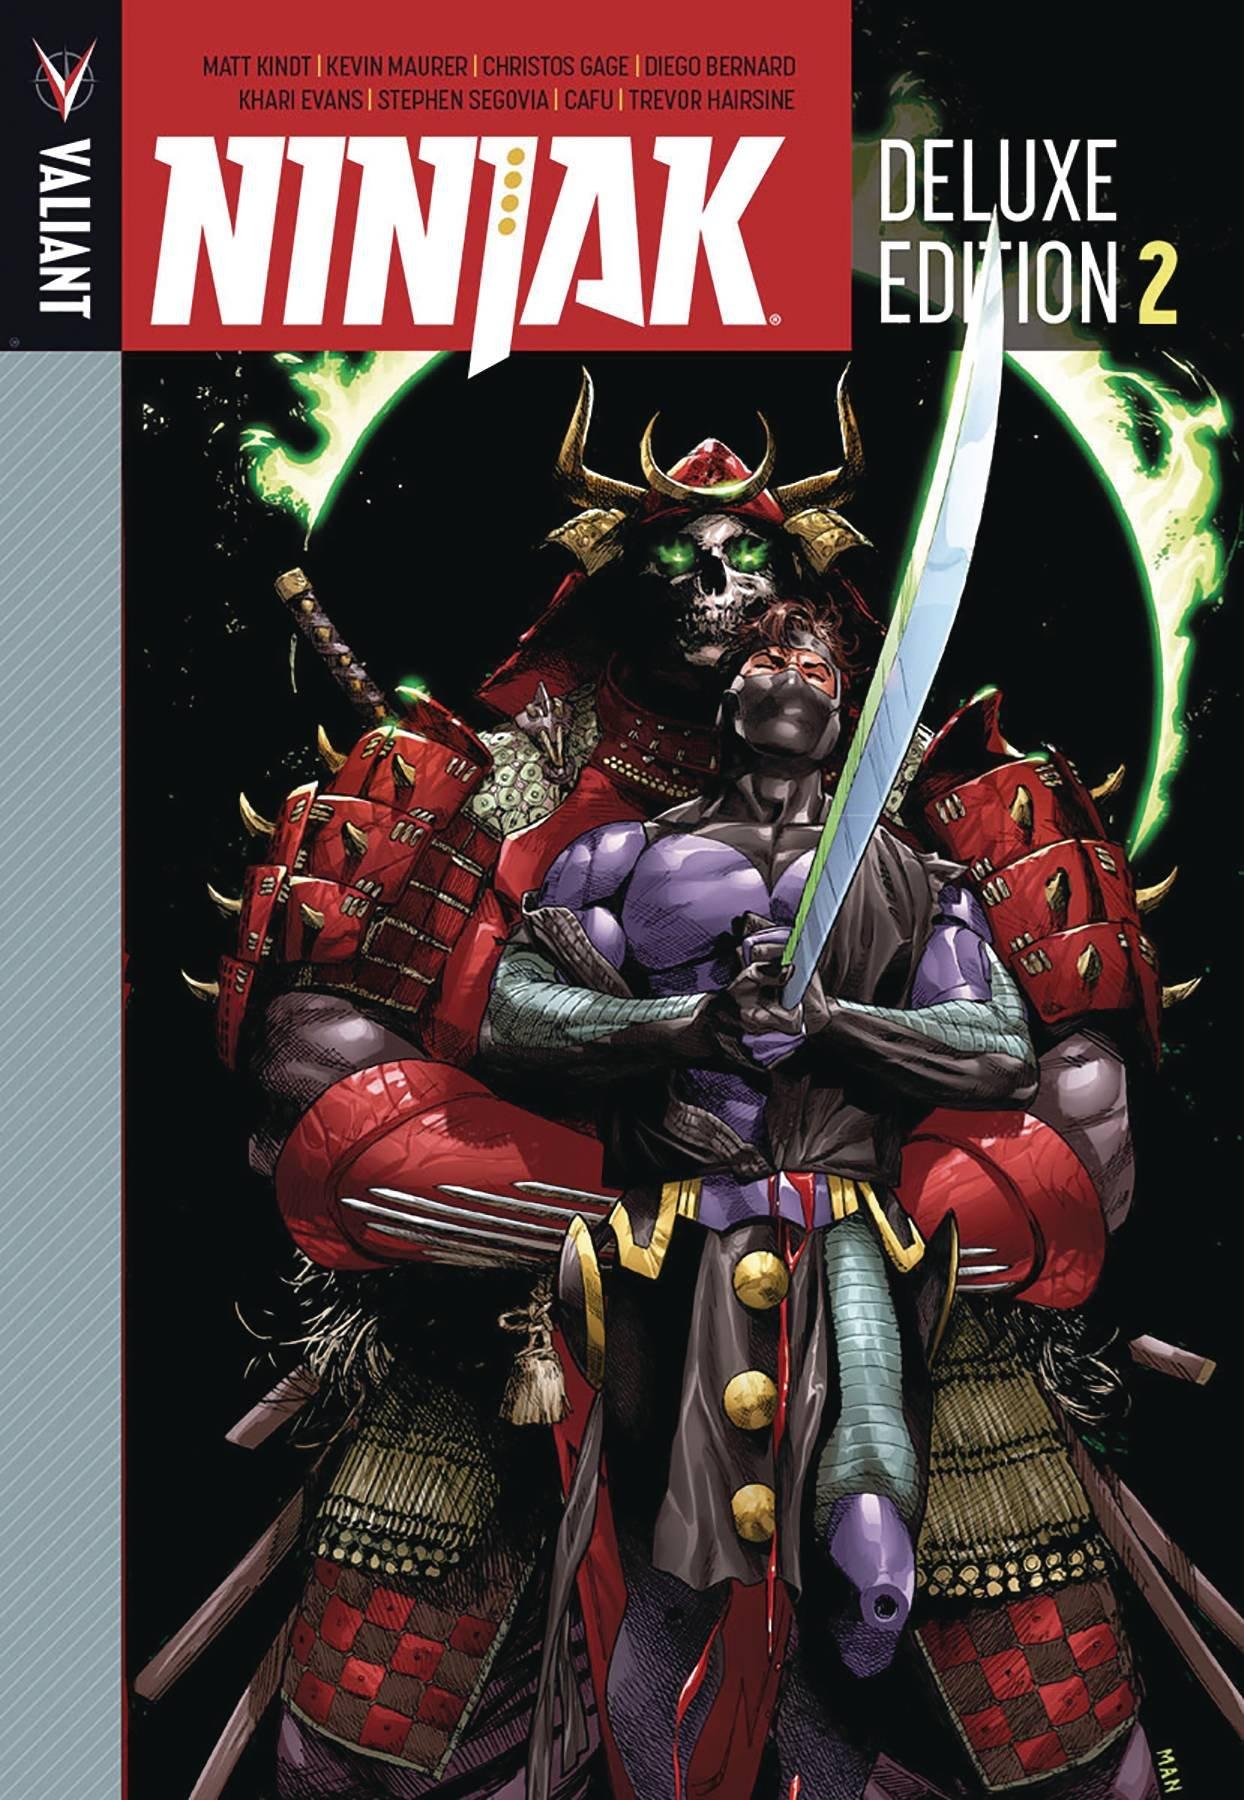 Ninjak Deluxe Edition Book 2: Matt Kindt, Kevin Maurer ...